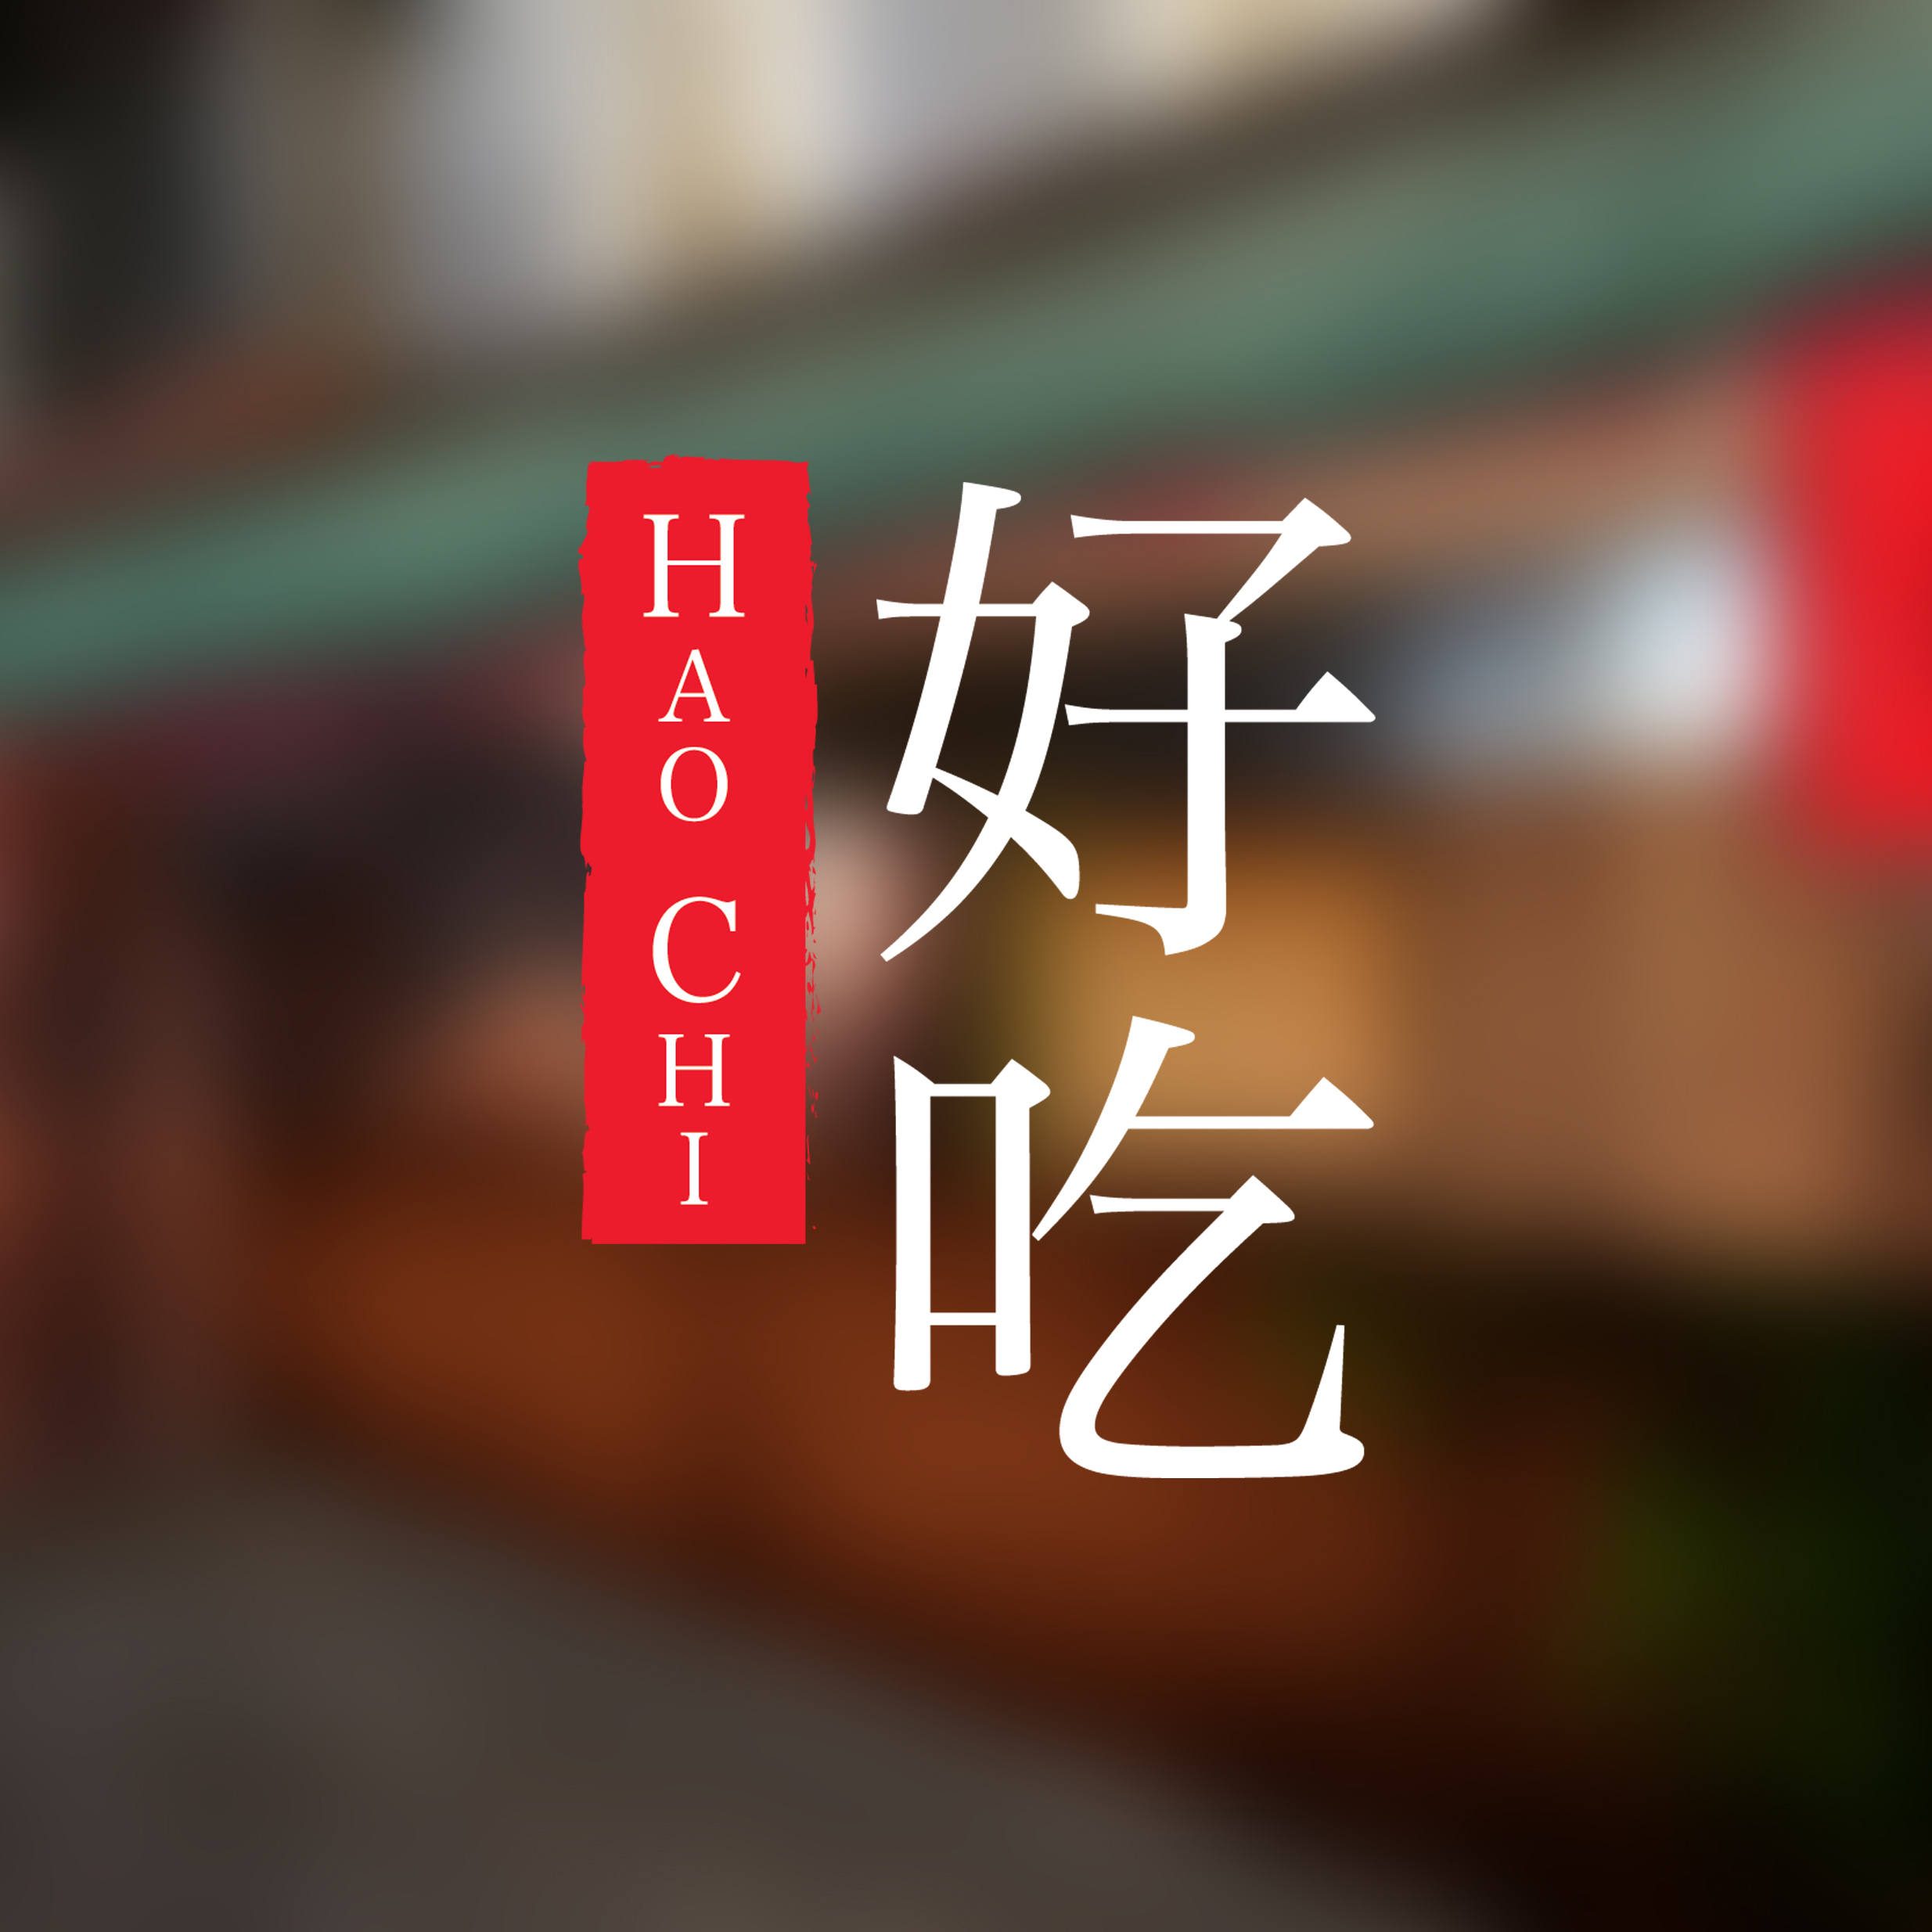 HAOCHI.jpg